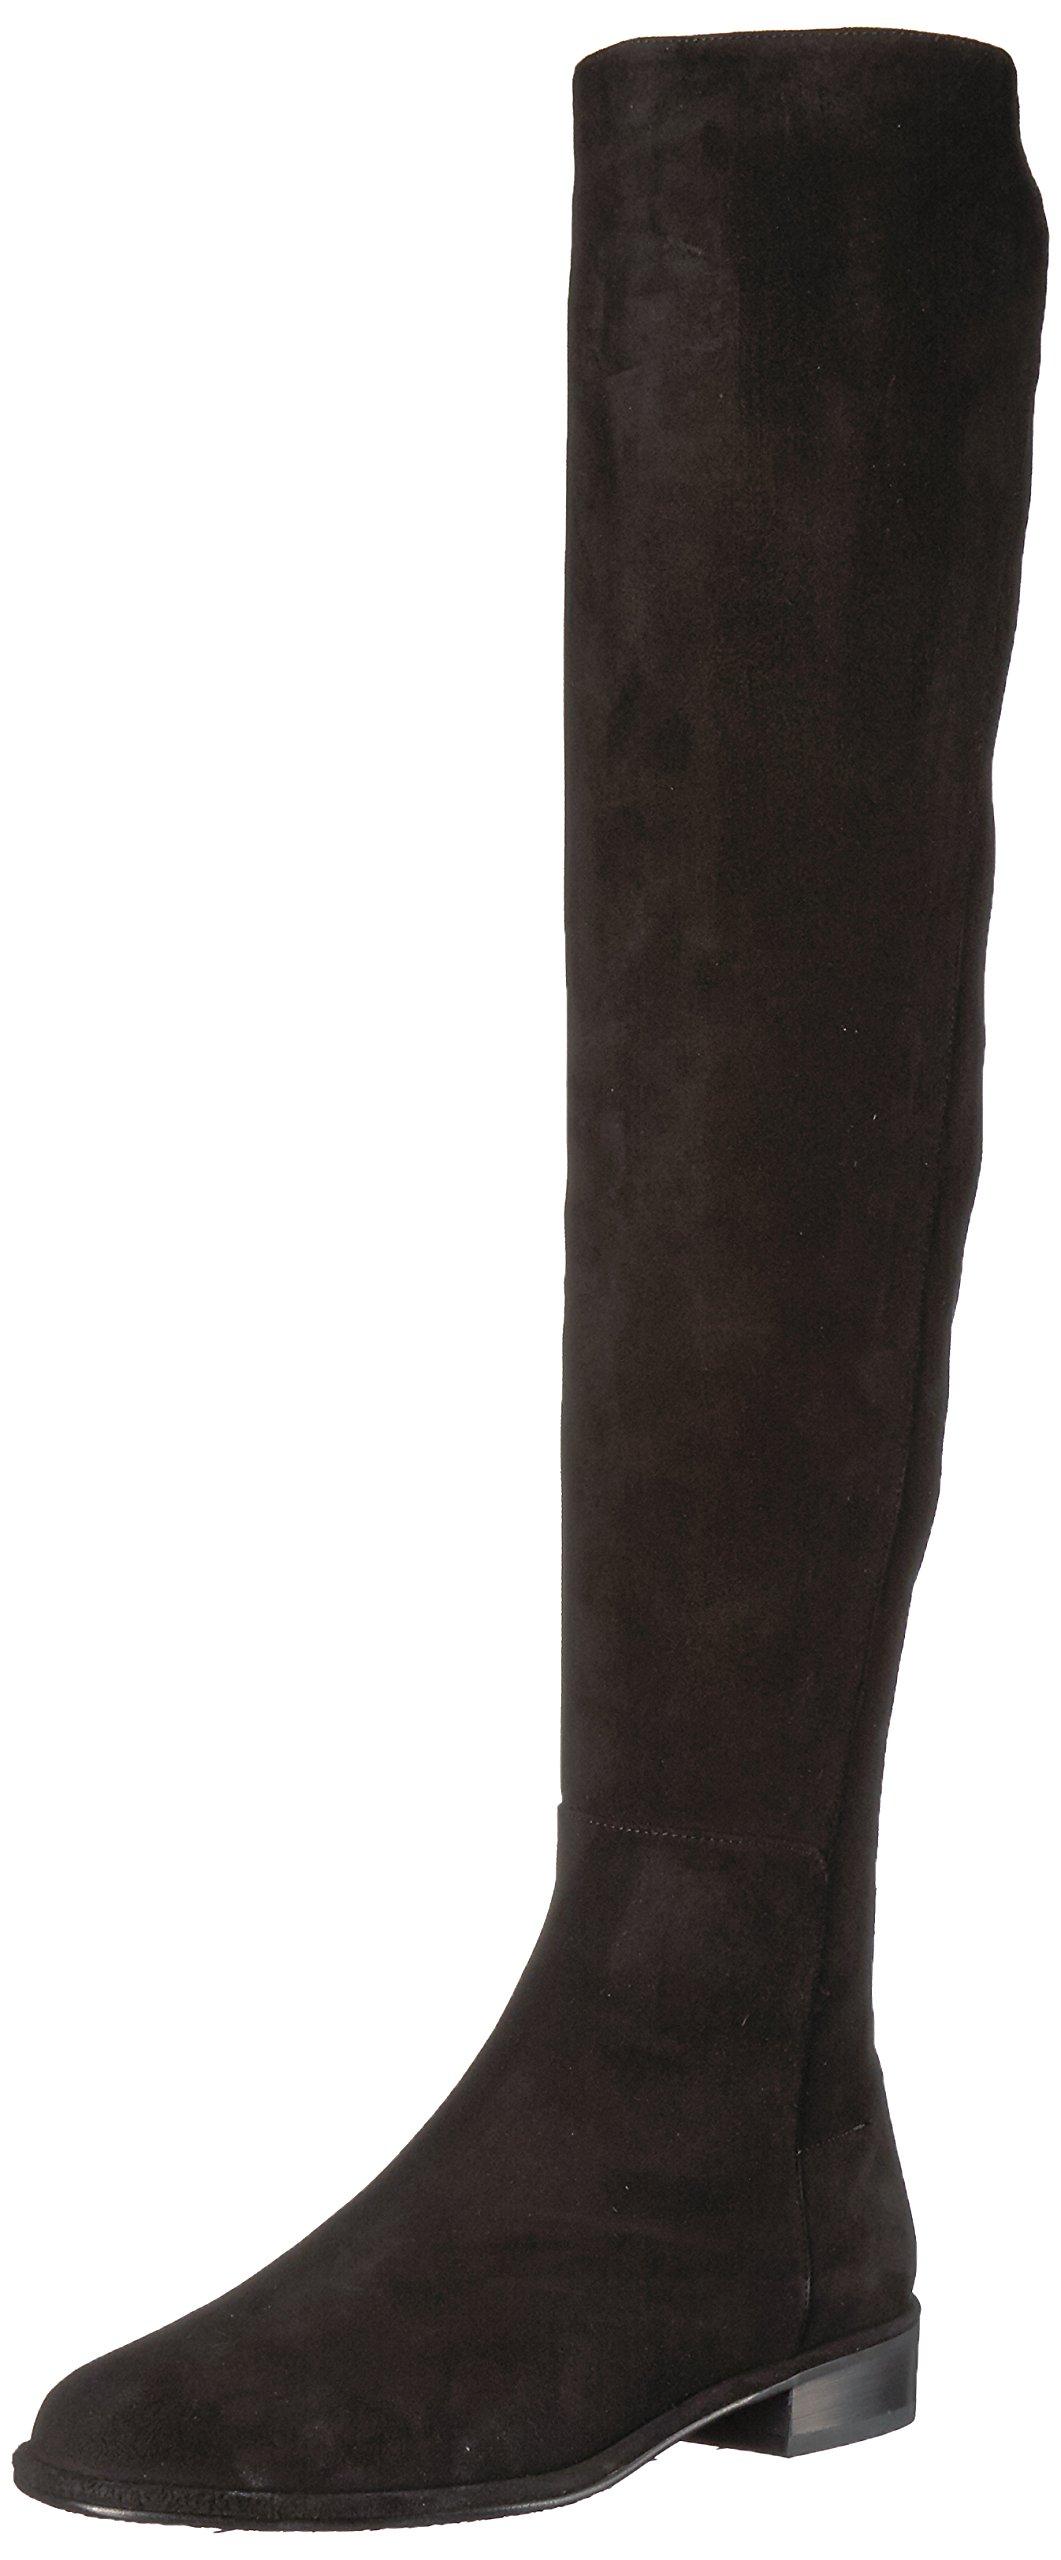 Stuart Weitzman Women's Allgood Knee High Boot, Black Suede, 9 Medium US